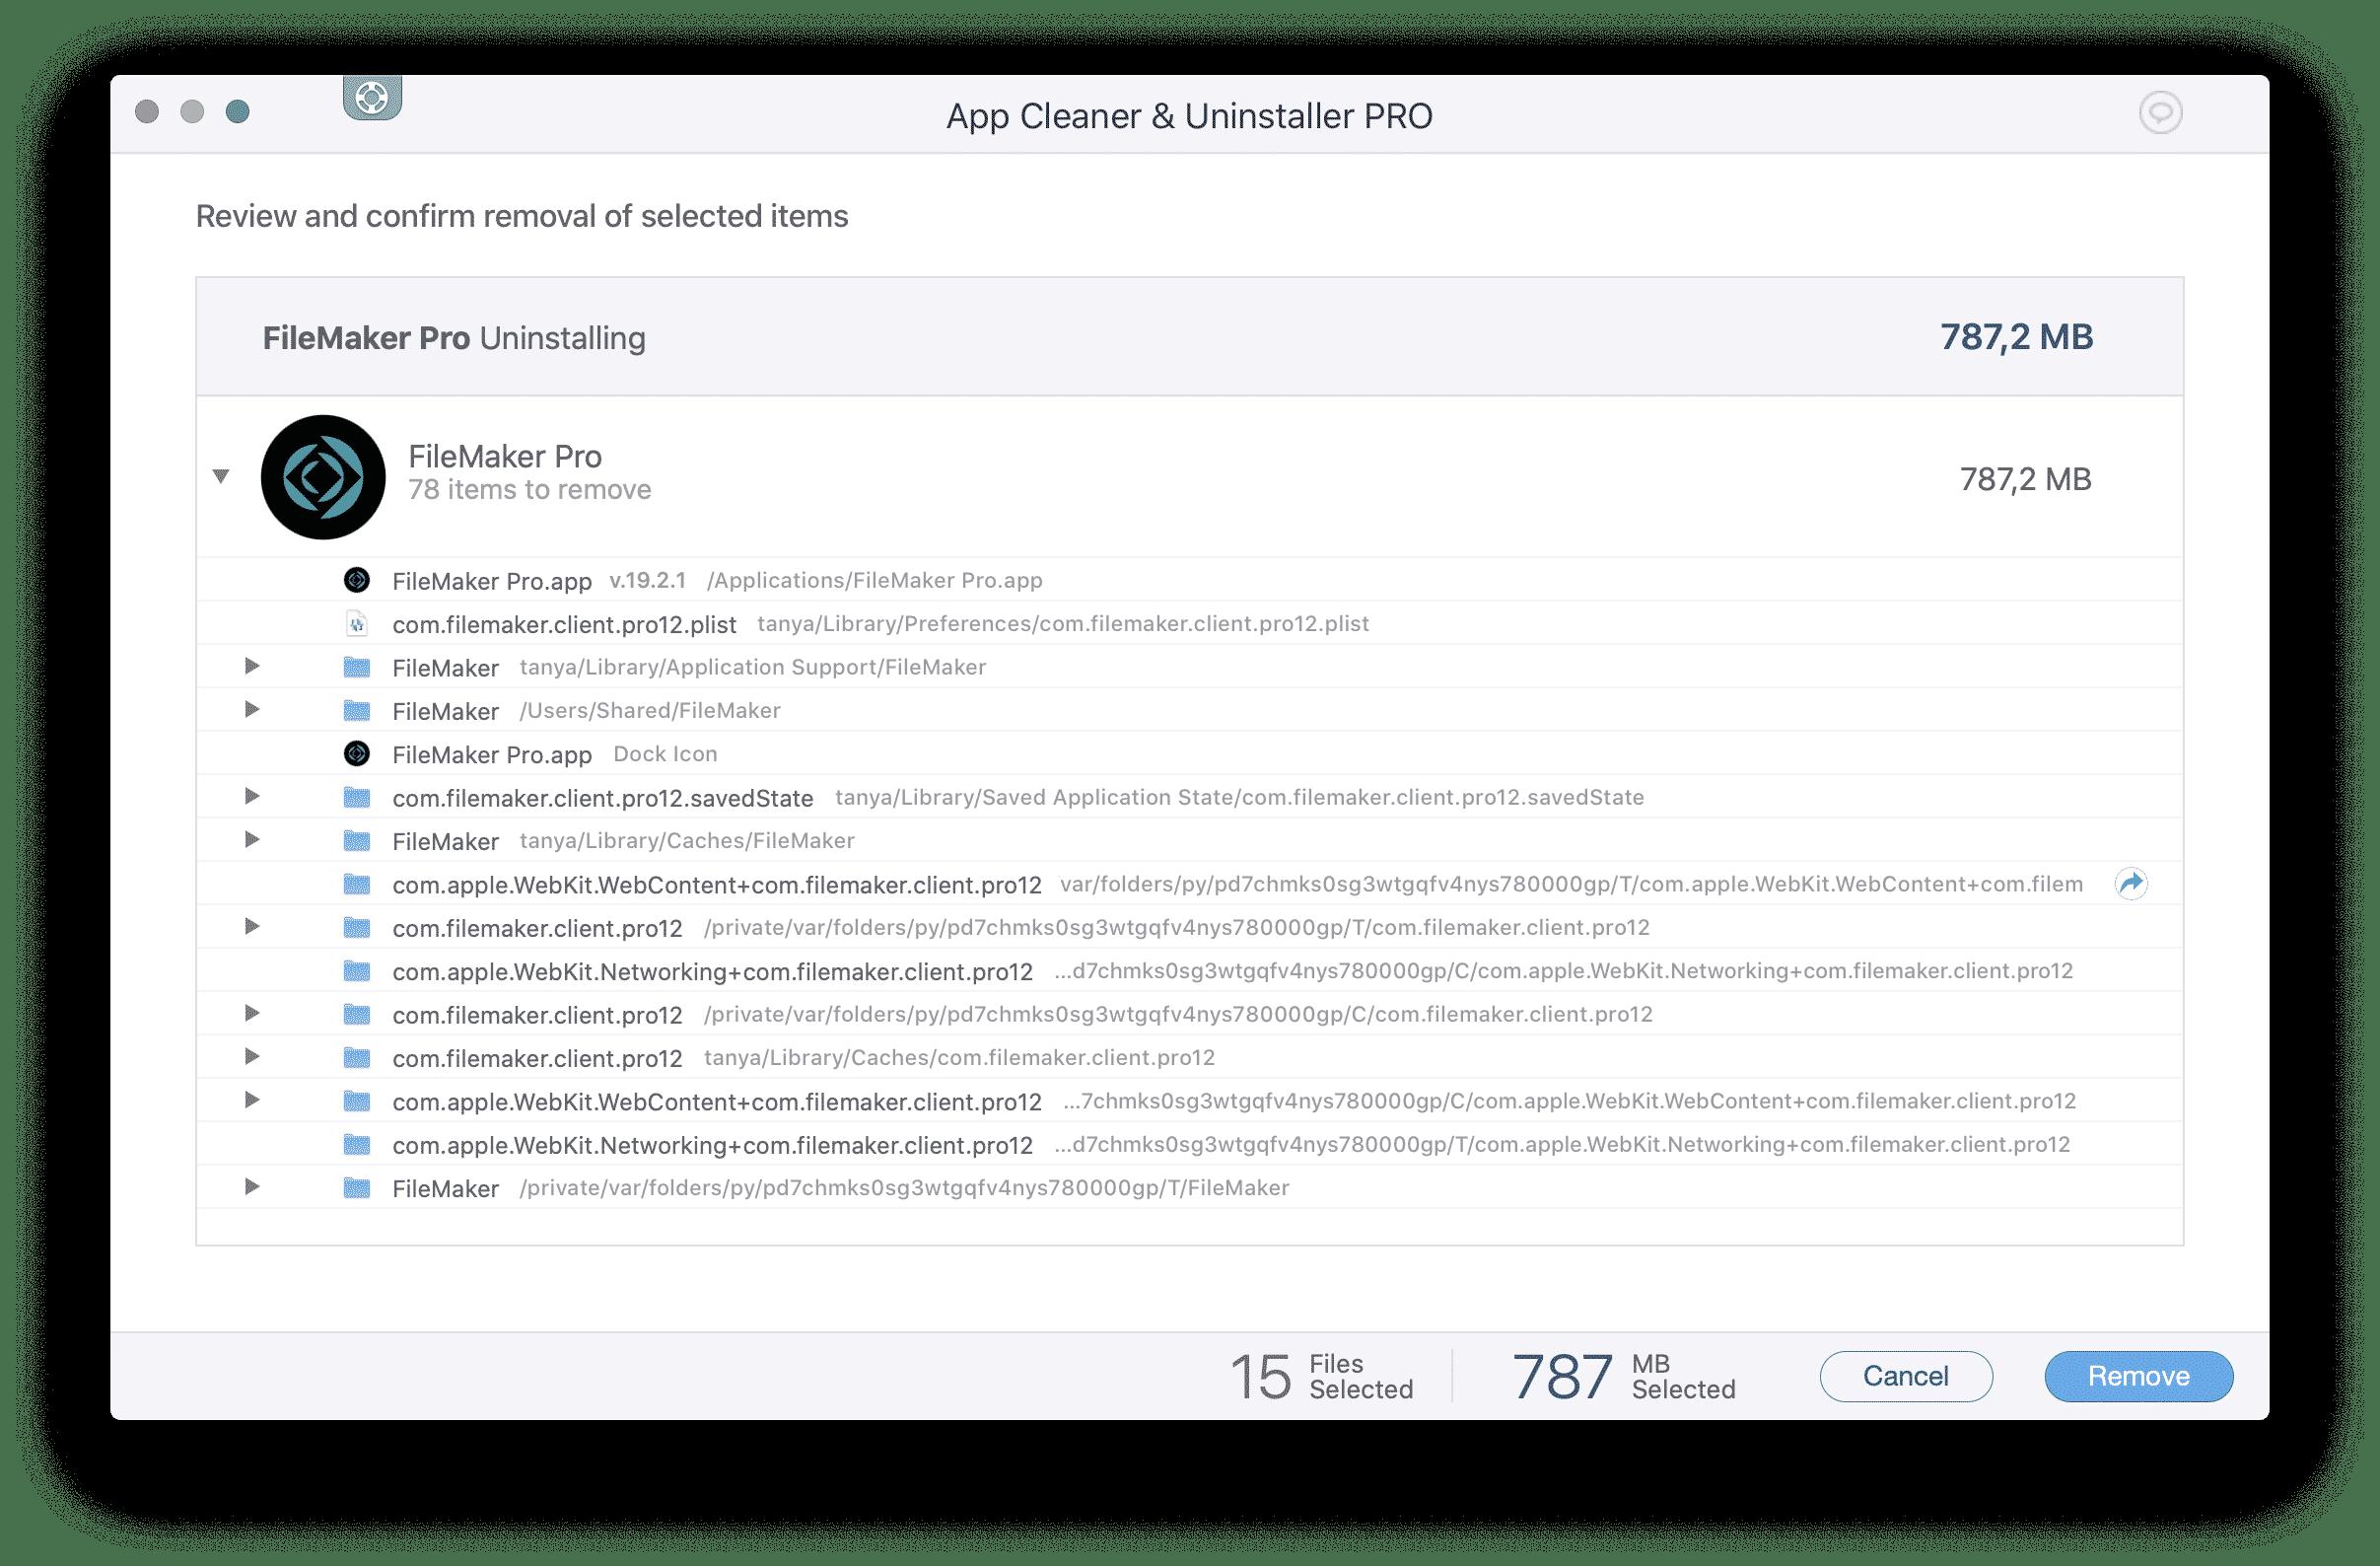 Uninstall FileMaker confirmation window of App Cleaner & Uninstaller